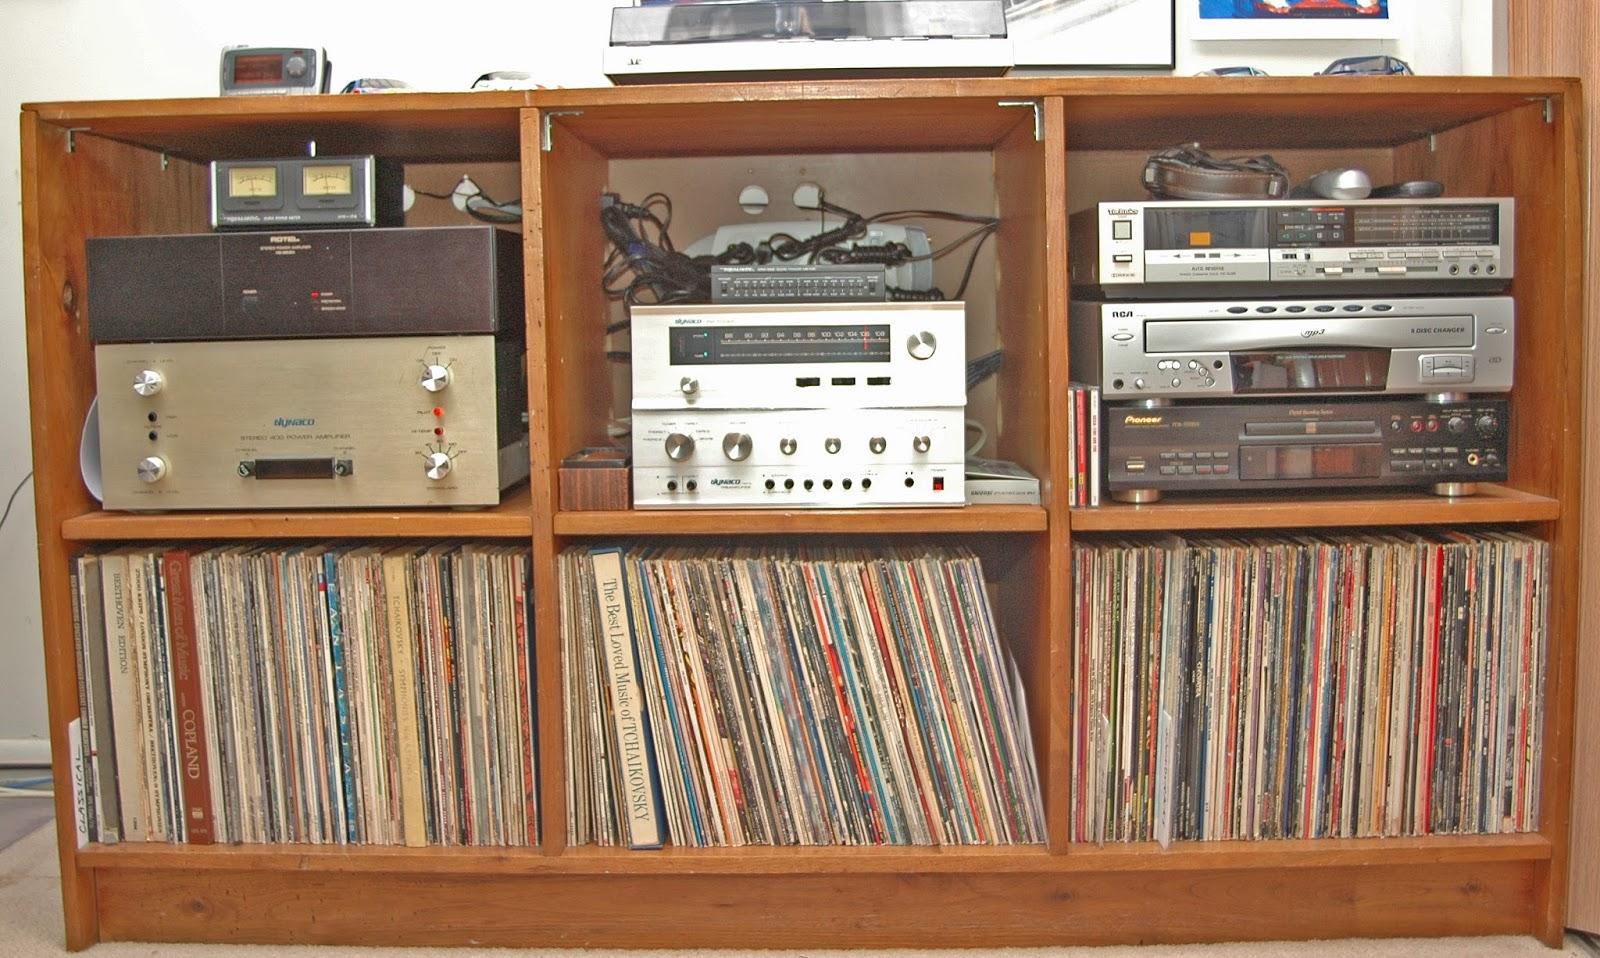 Dynaco, the Legendary American Audio equipment company